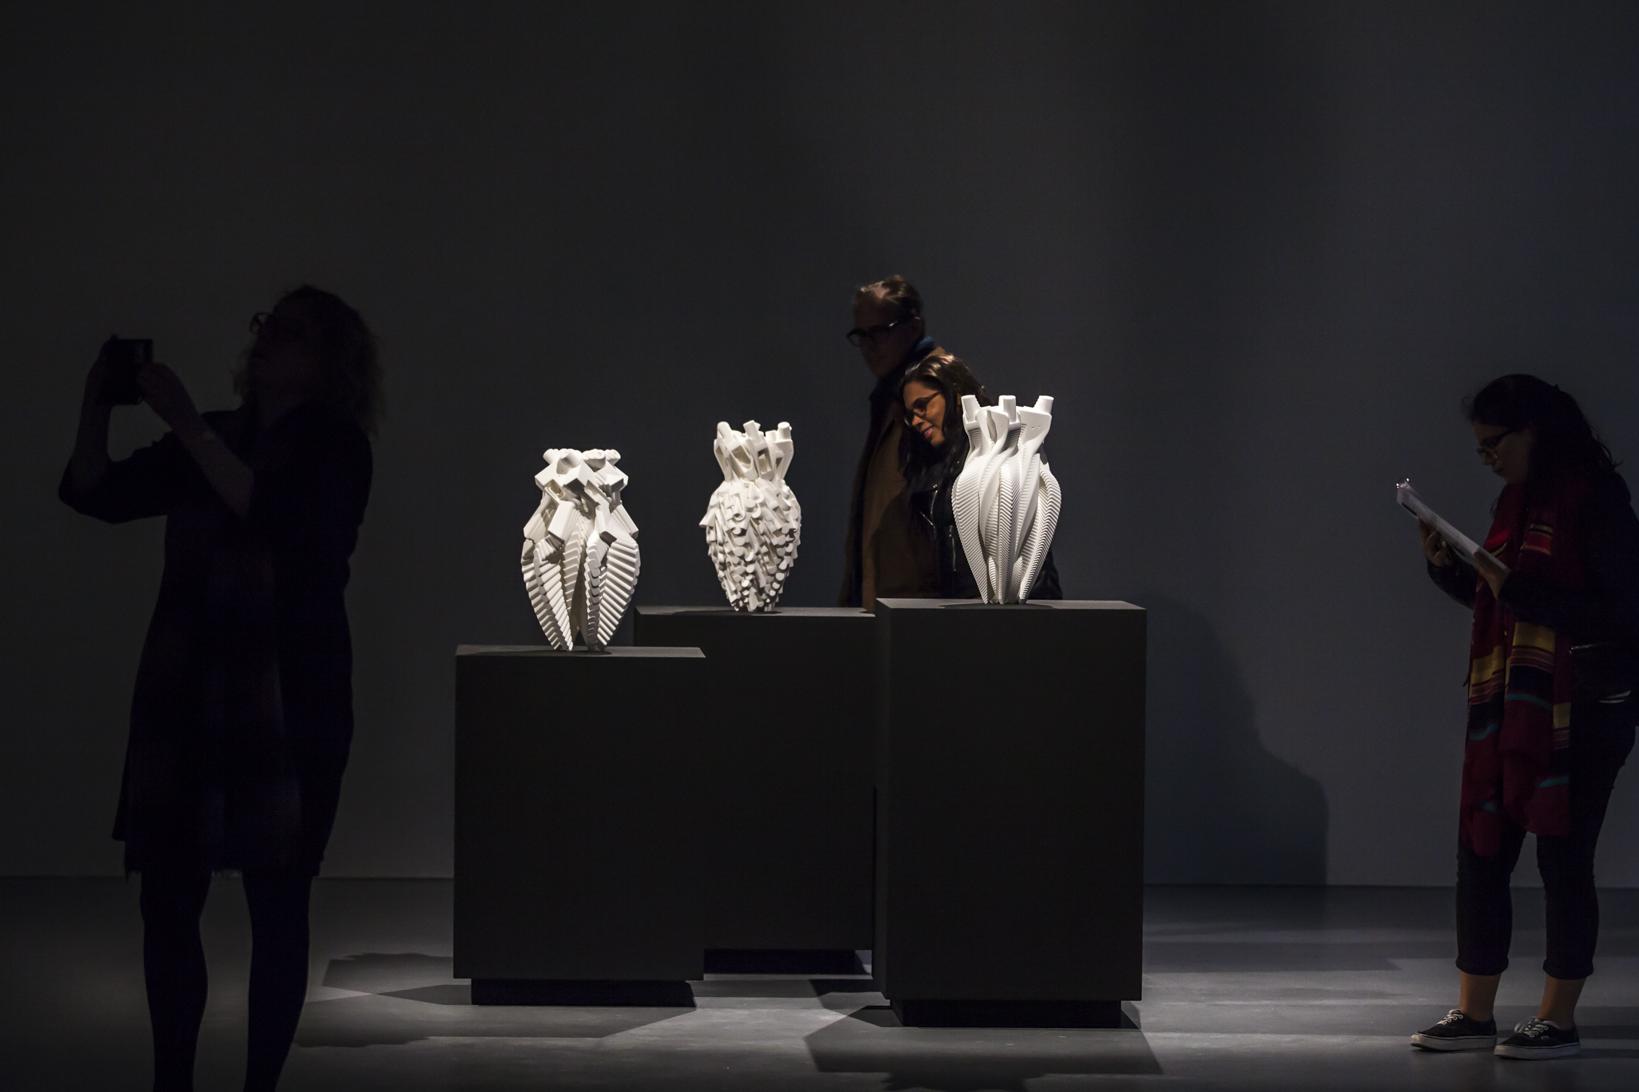 Vases on Display. Photo Credit : Hanneke Wetzer